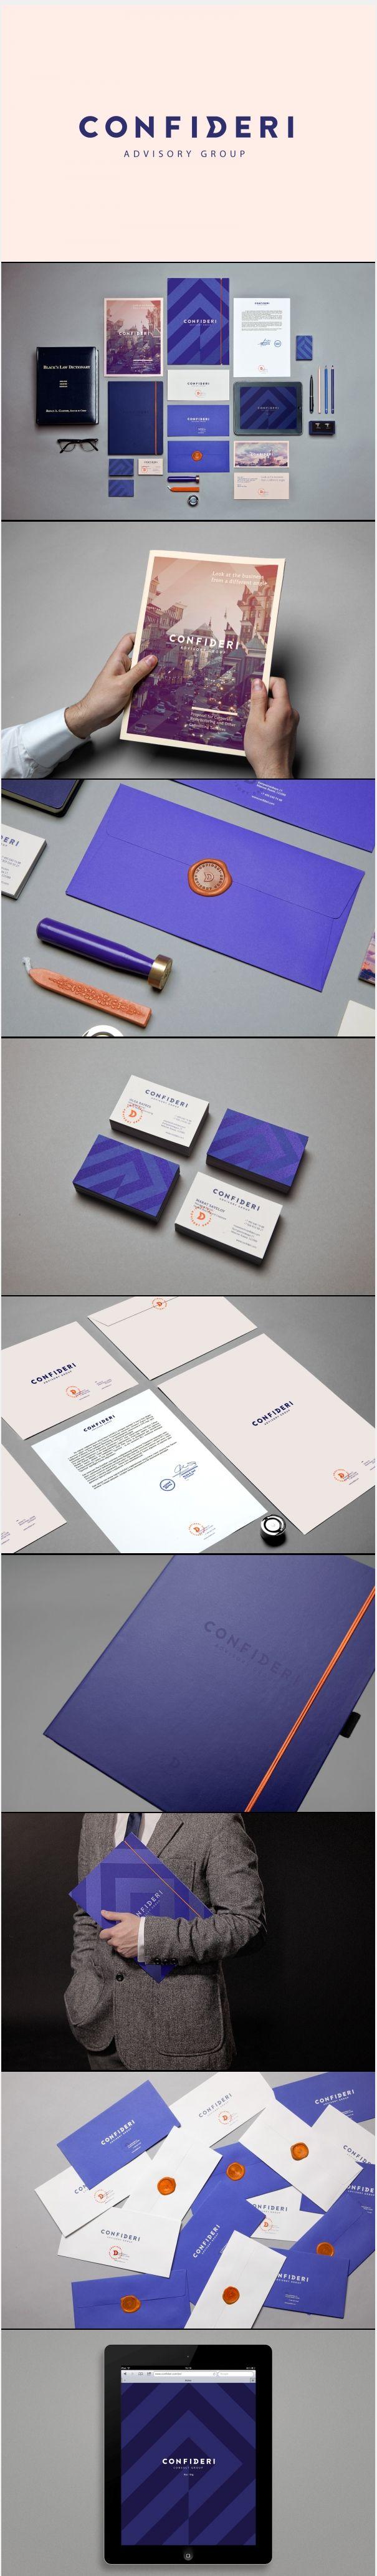 CONFIDERI #branding #logo